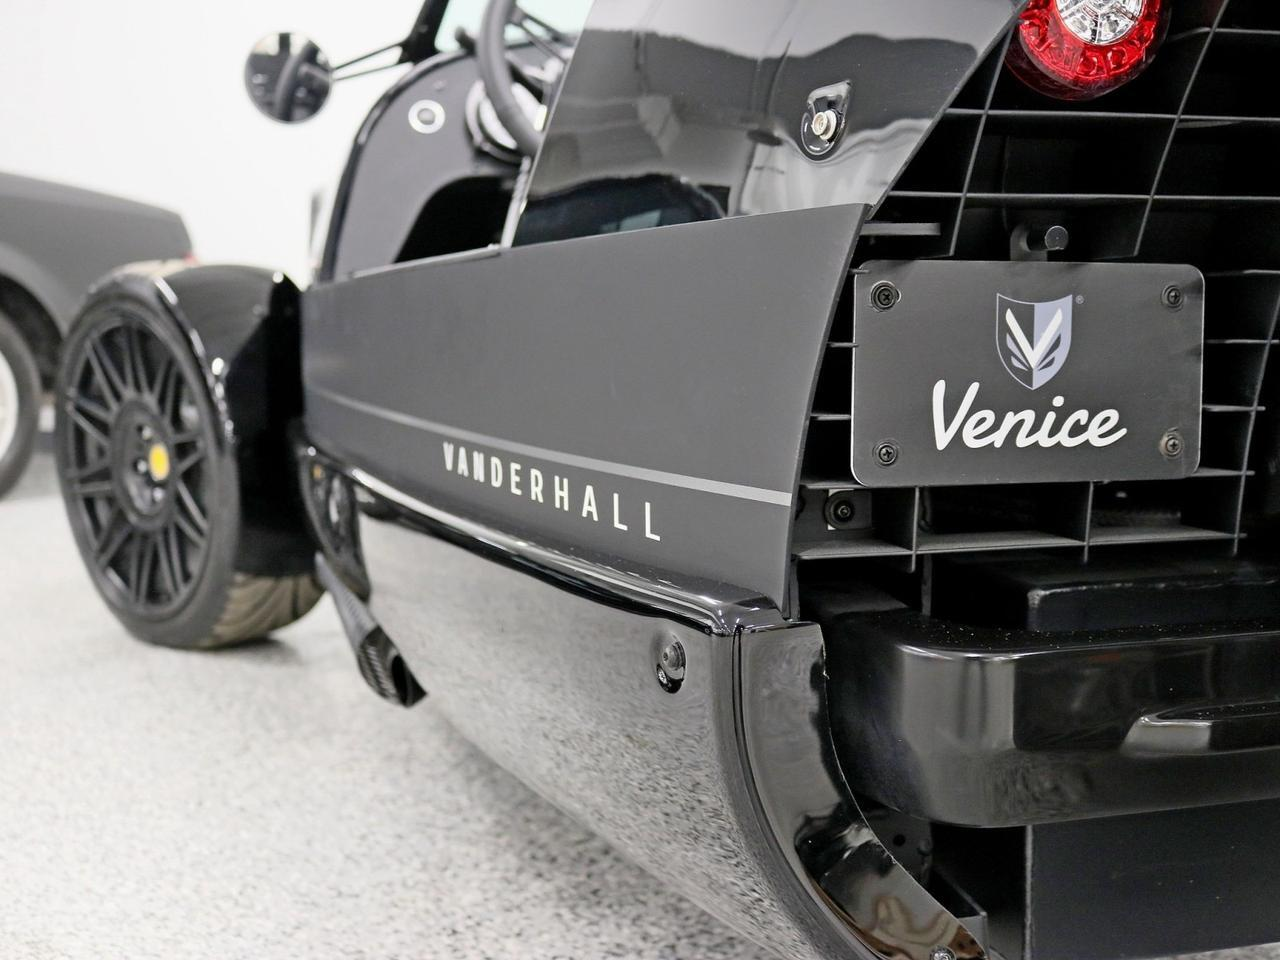 2021 Vanderhall Venice Blackjack  Hickory Hills IL